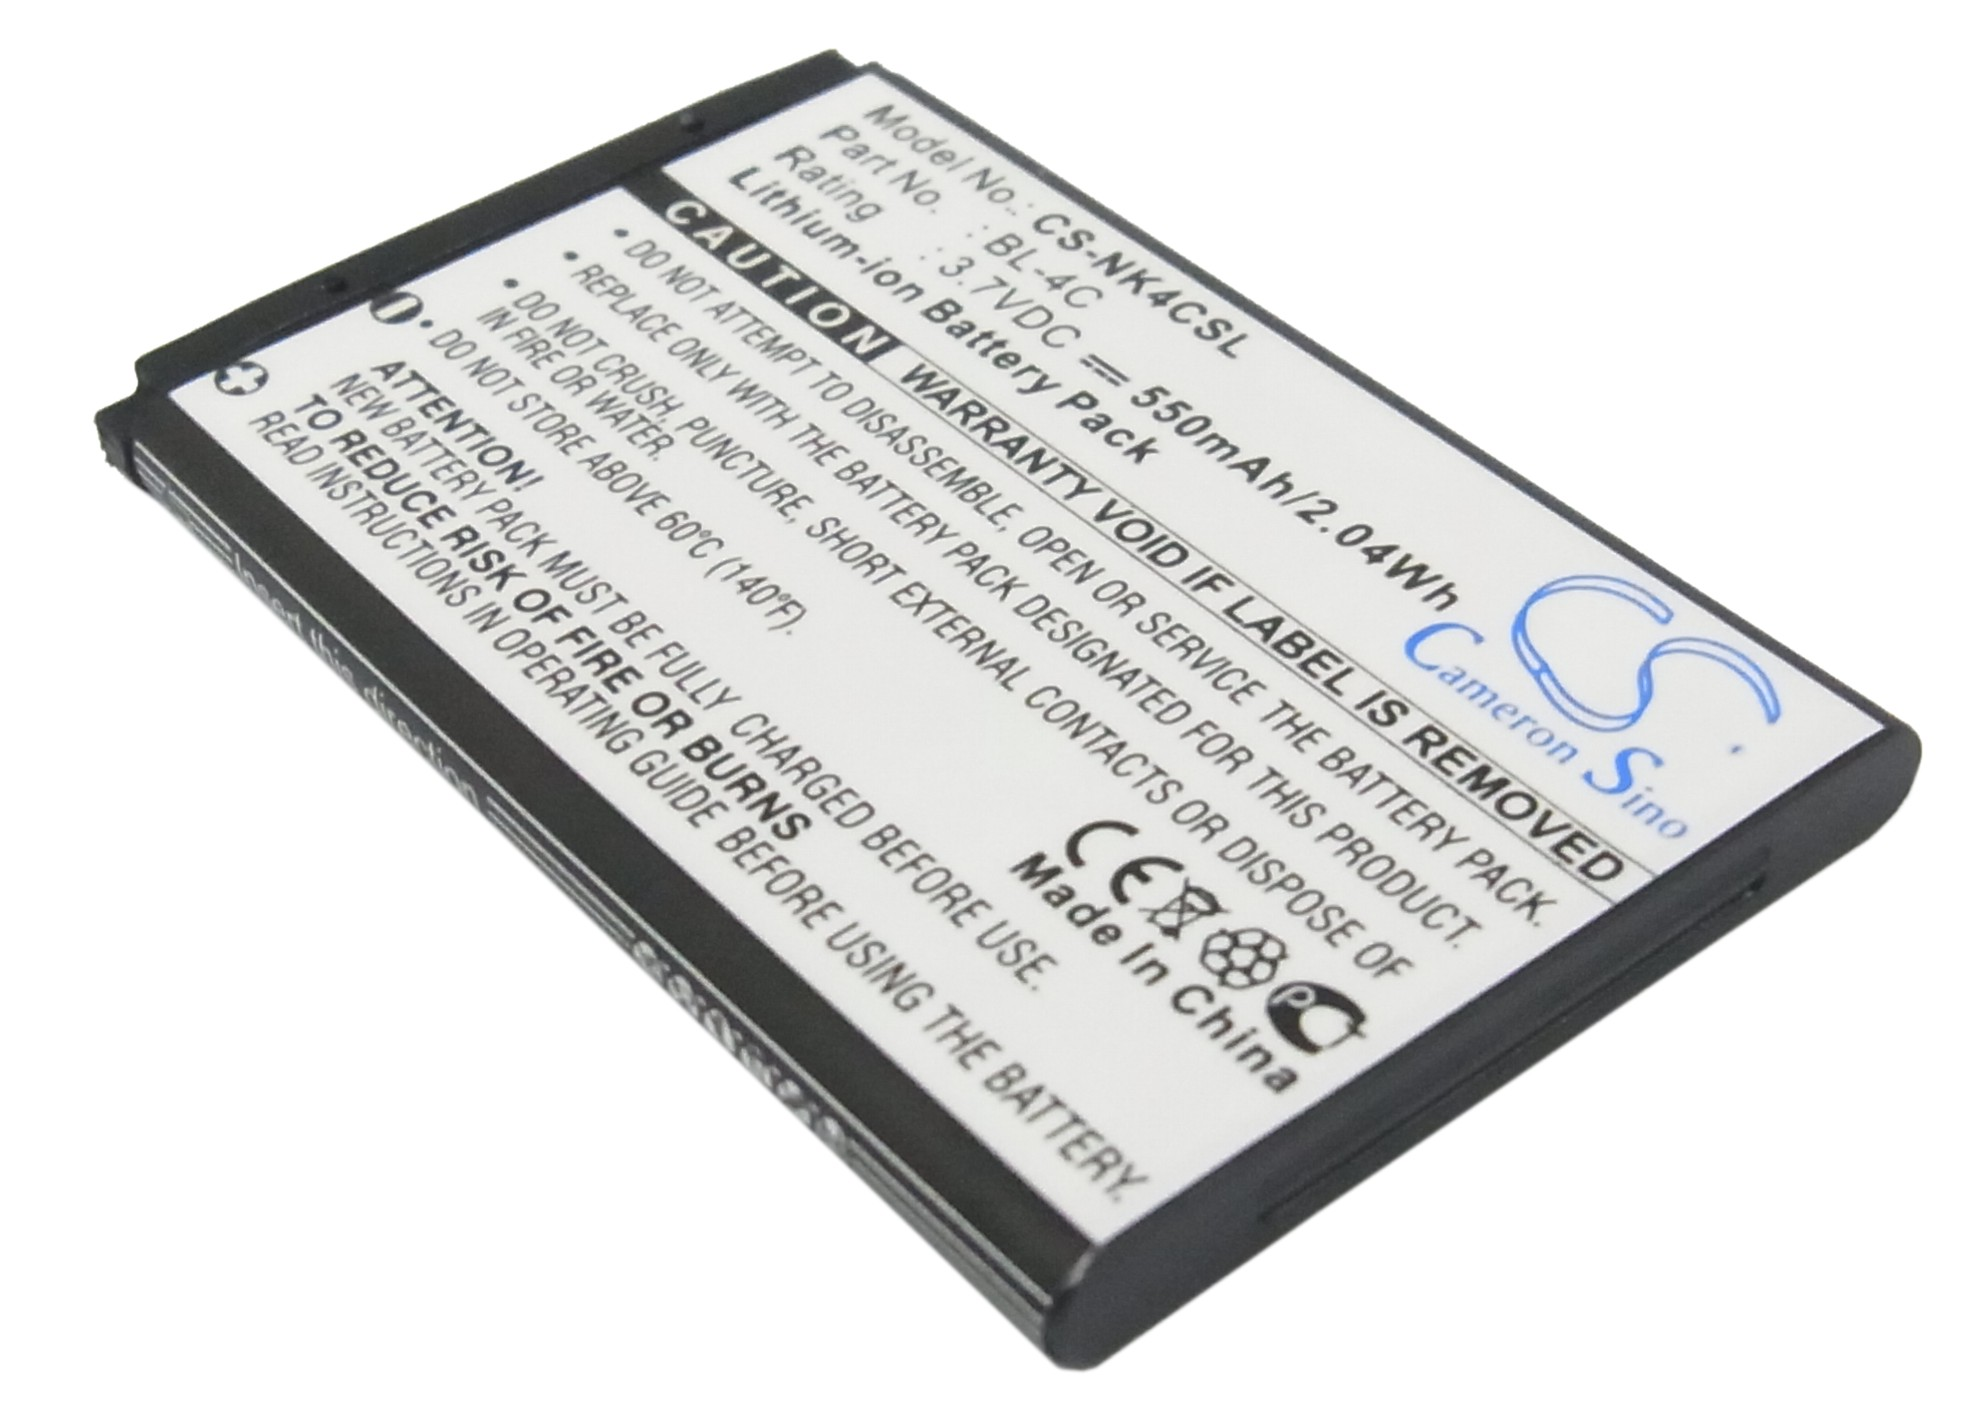 Cameron Sino baterie do mobilů pro NOKIA 2650 3.7V Li-ion 550mAh černá - neoriginální